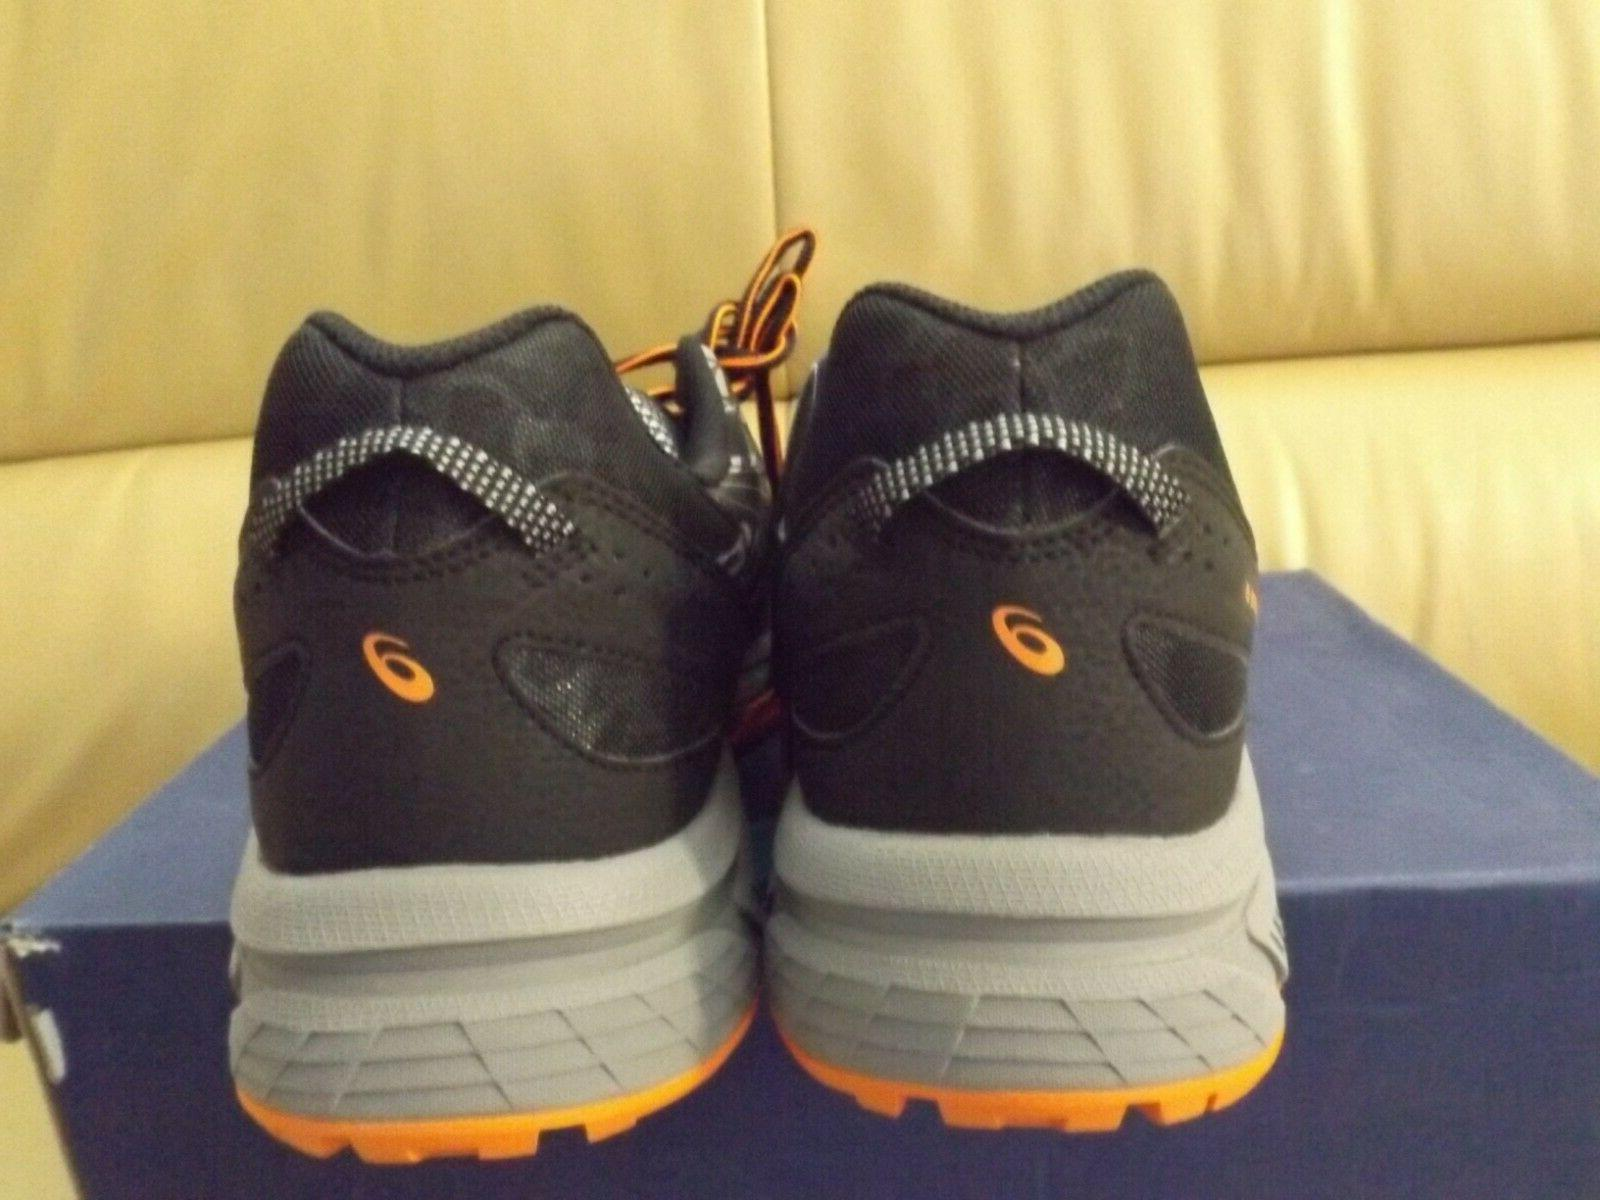 ASICS GEL-Venture Men's Size 14 Shoes Grey NEW